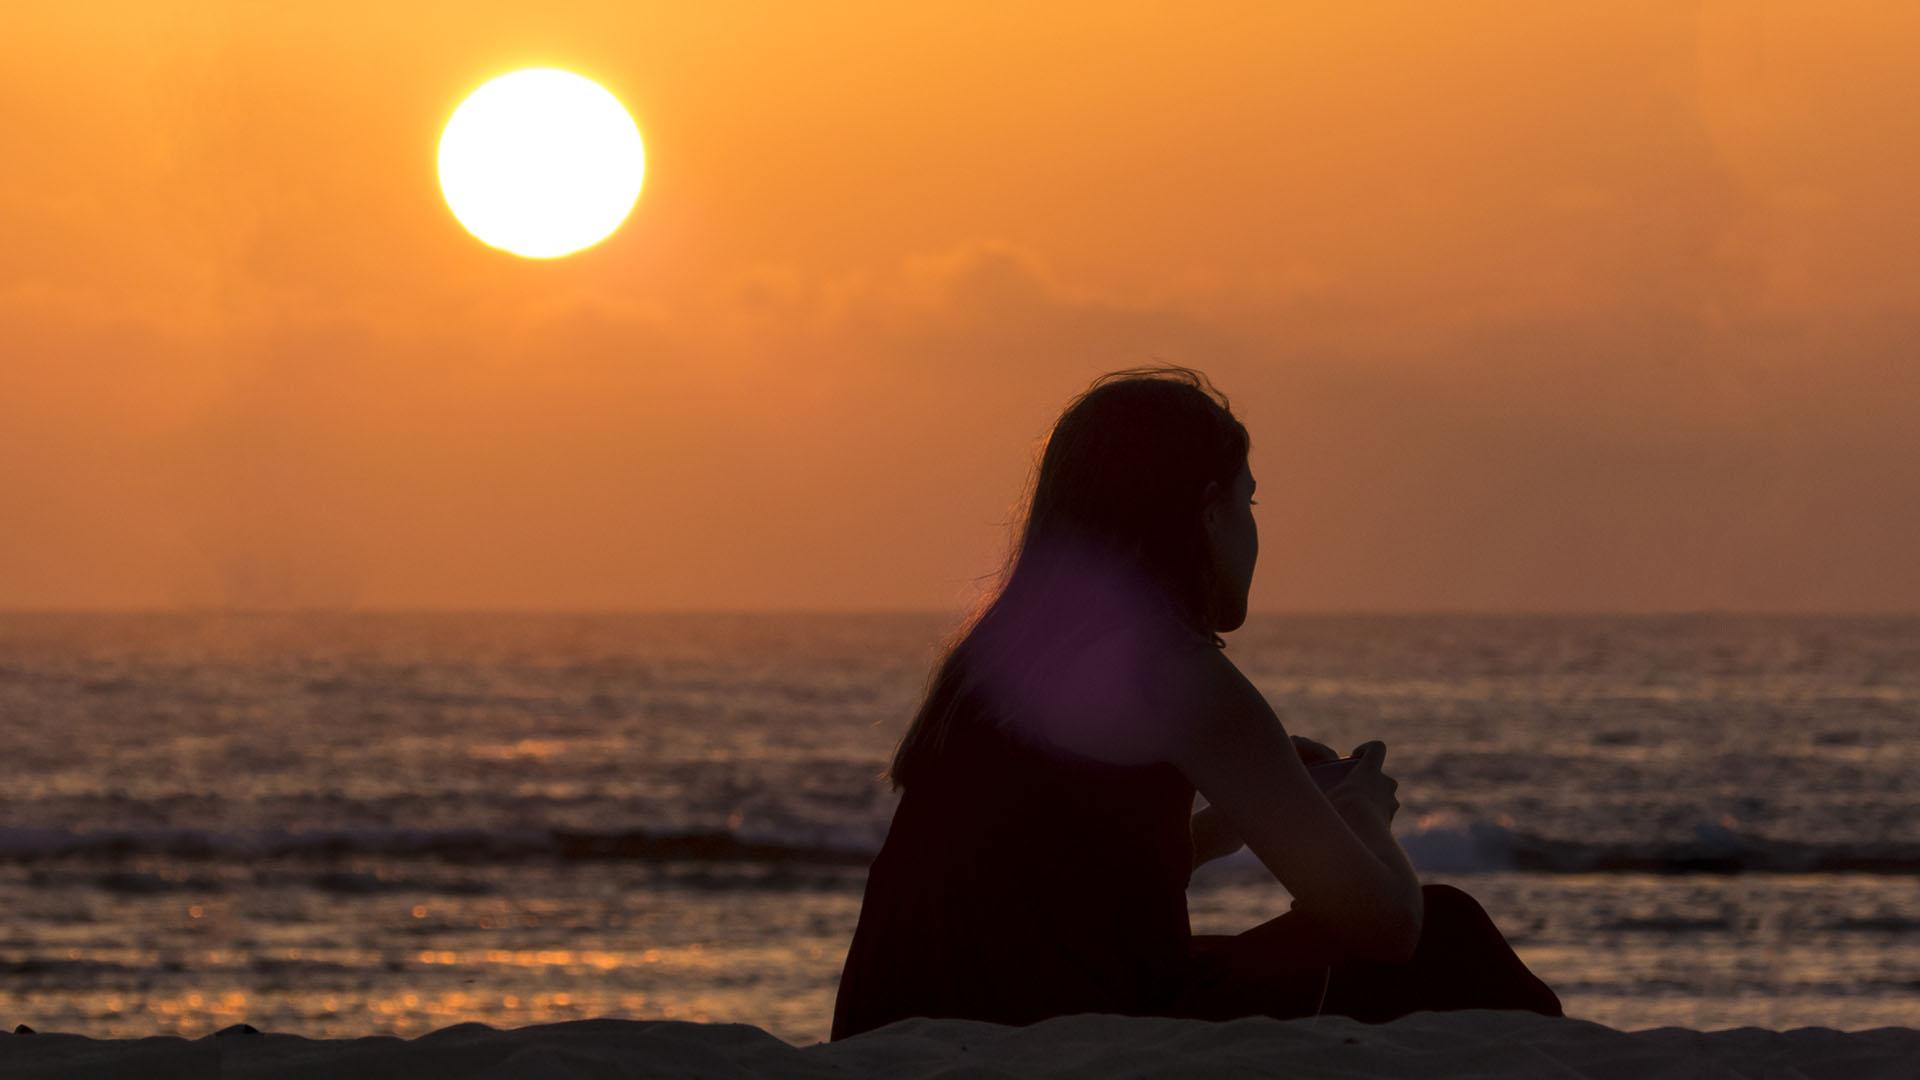 Die Strände Fuerteventuras: Playa de Marfolin (Los Lagos)